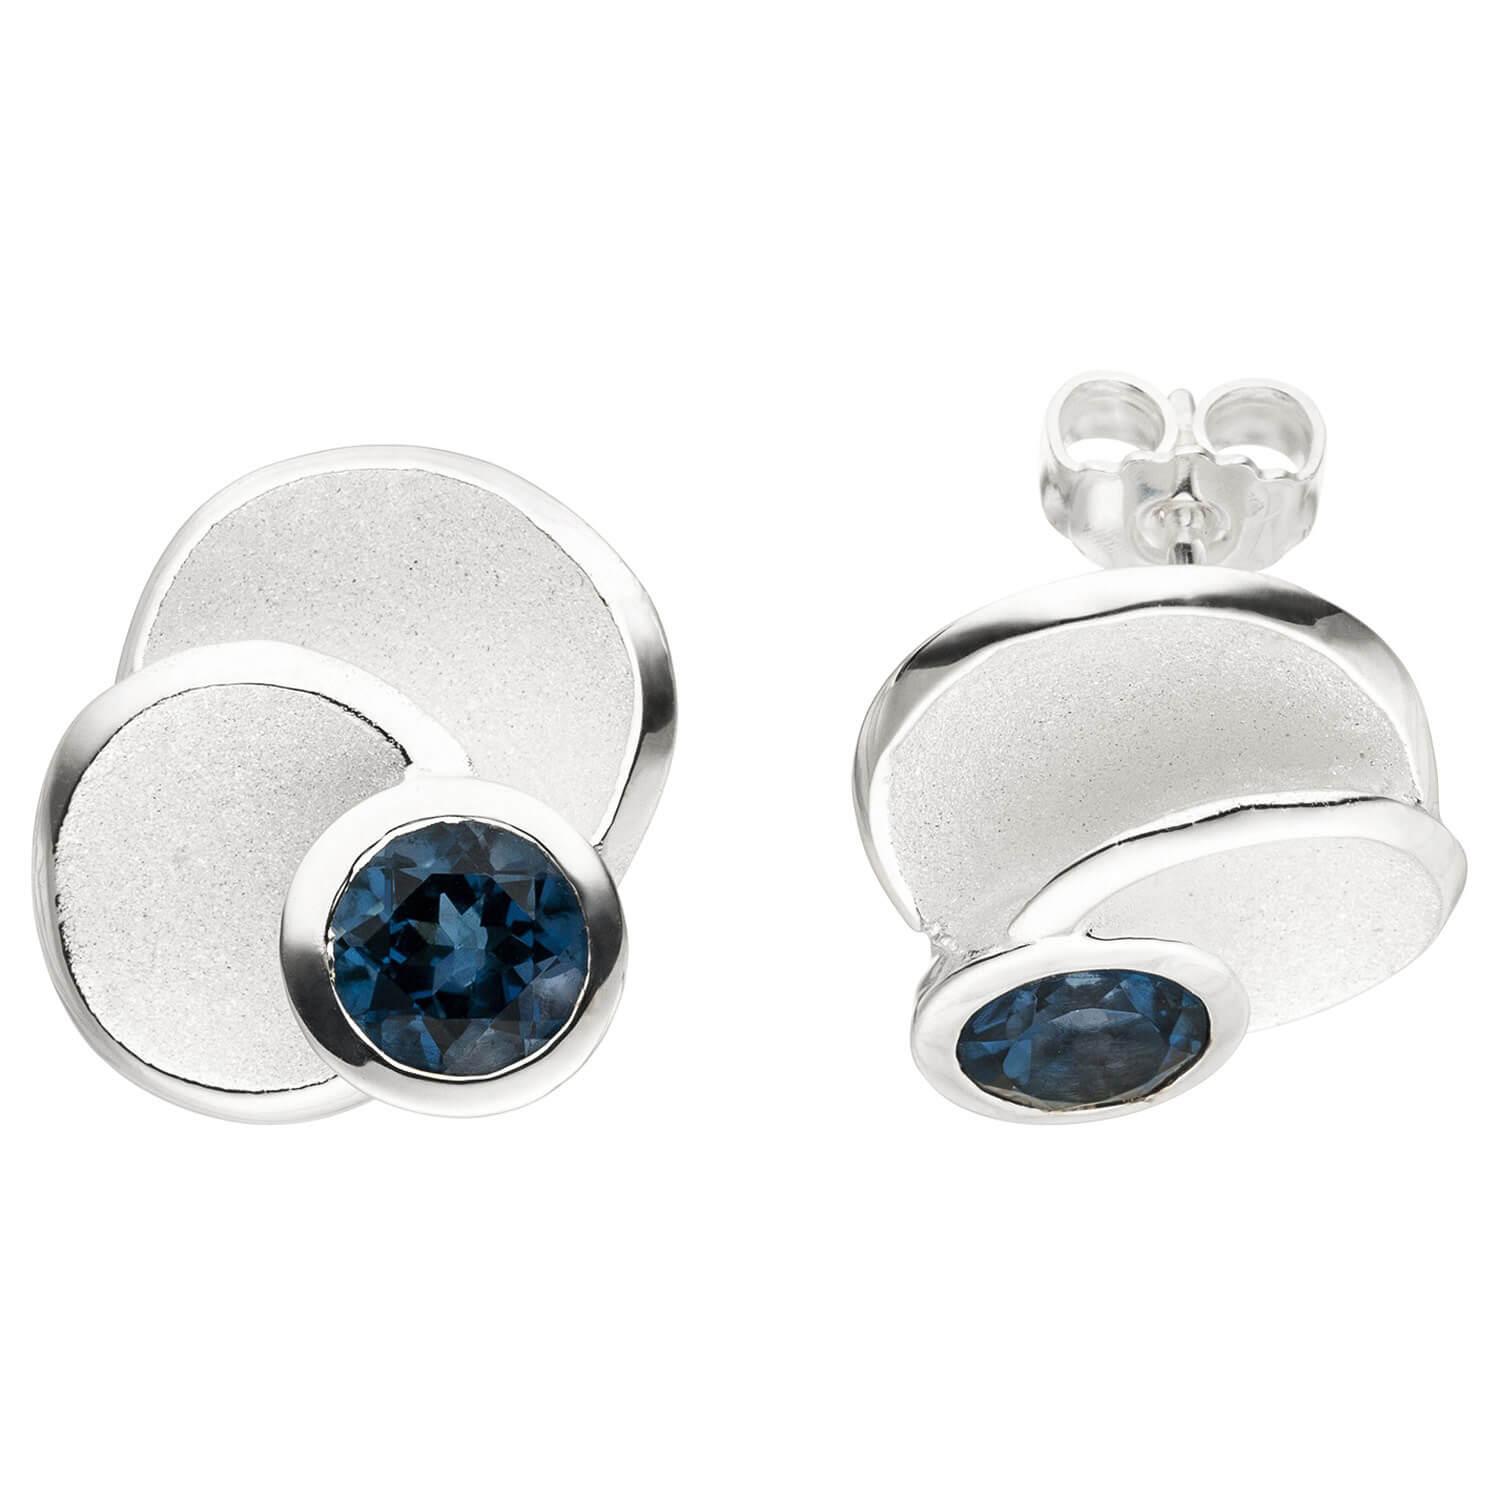 22,3 mm Damen Ring 925 Sterling Silber matt eismatt 1 Blautopas blau Breite ca